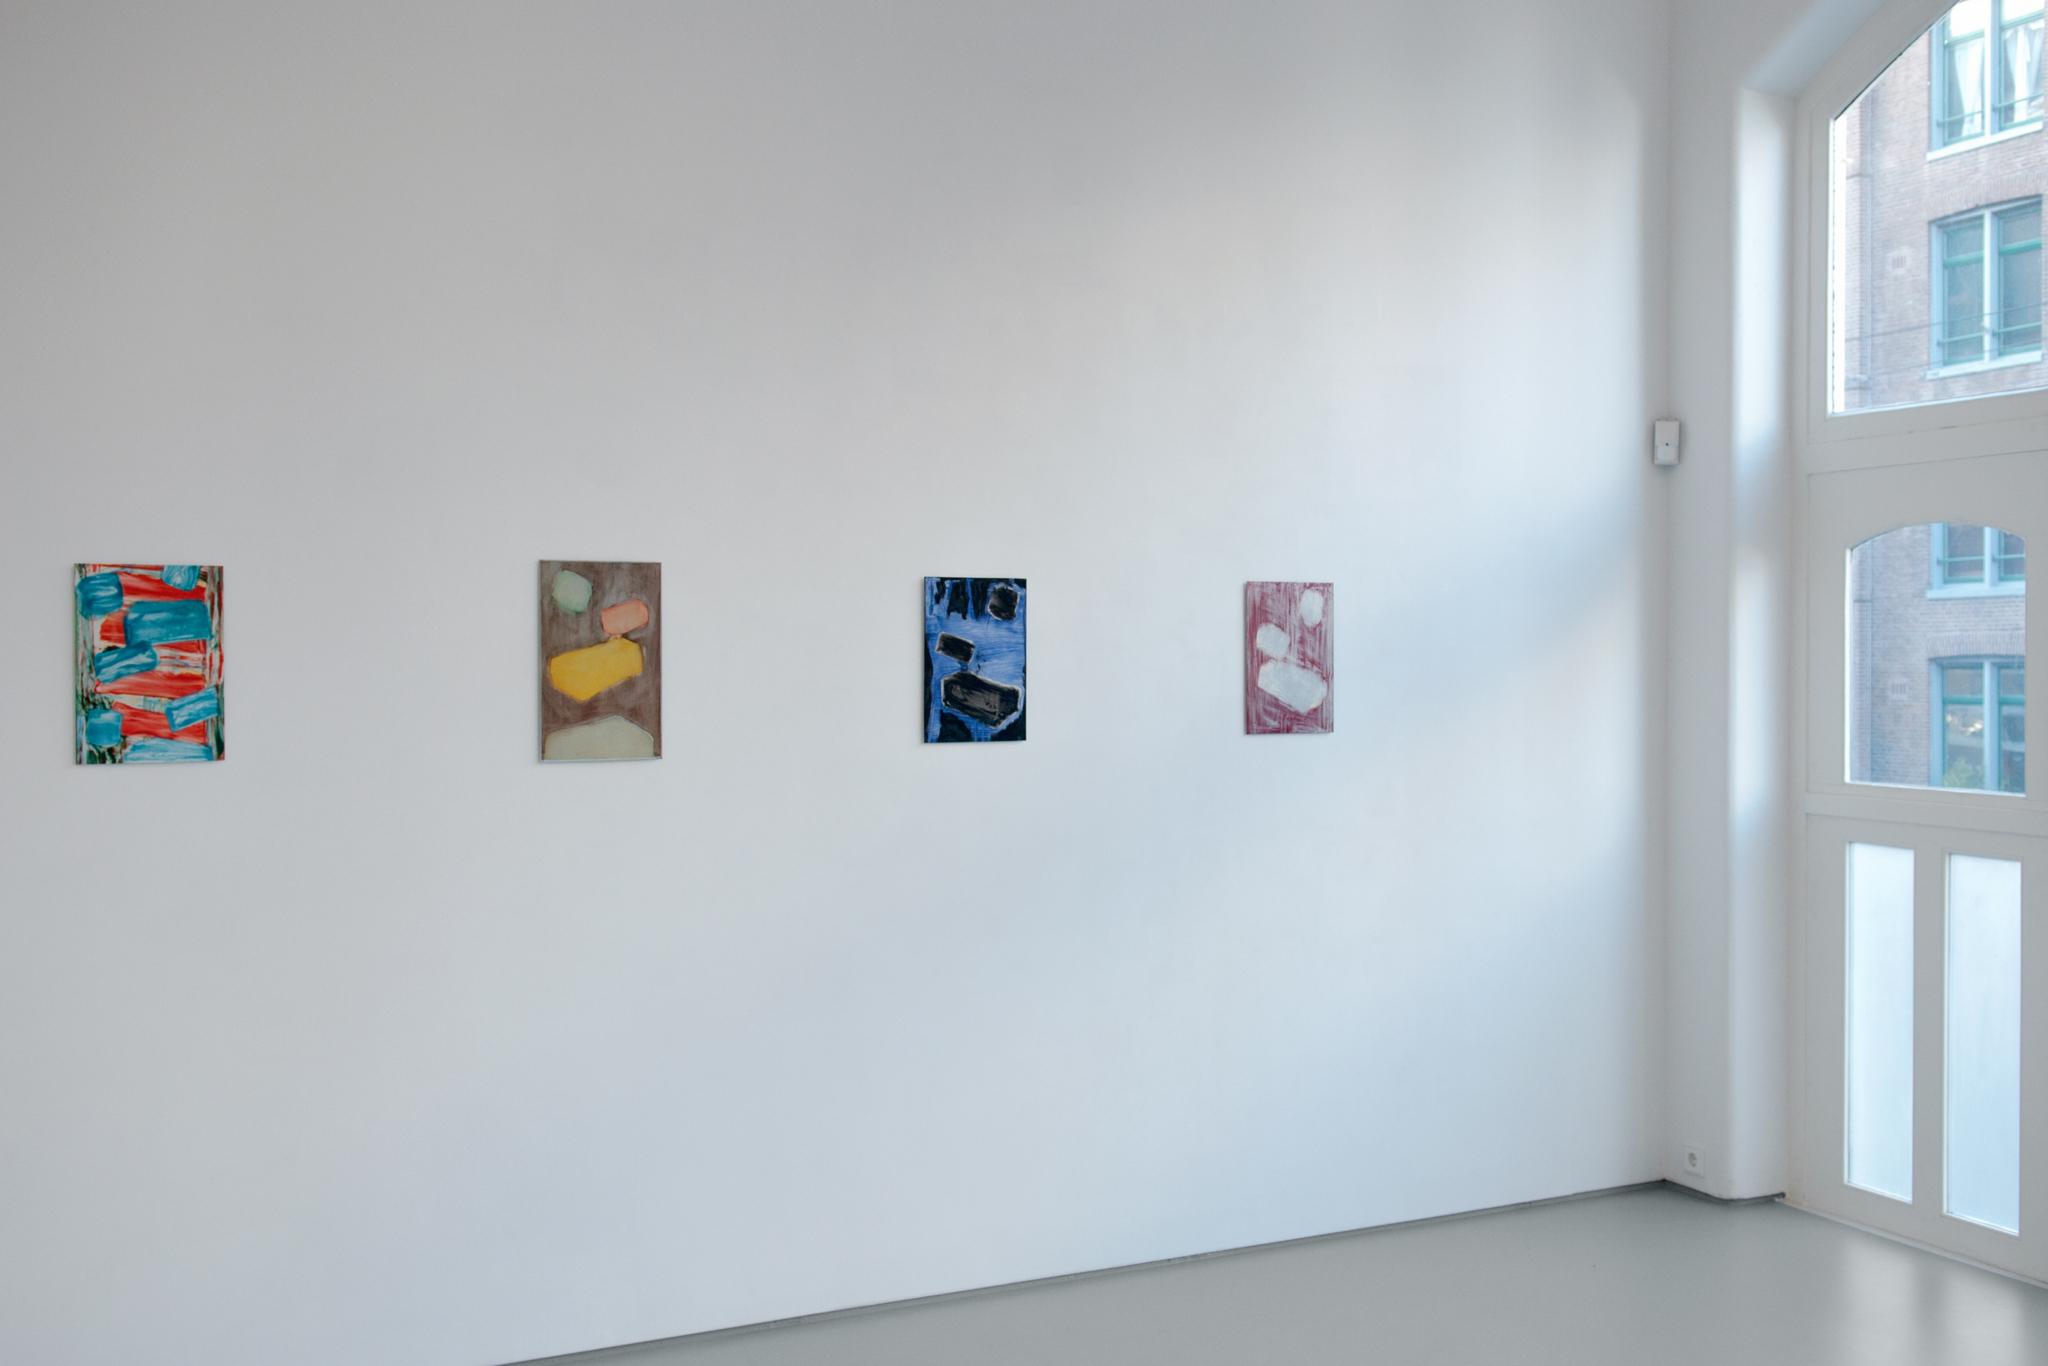 Toon-Verhoef-Galerie-Onrust-EX-2015-02-L